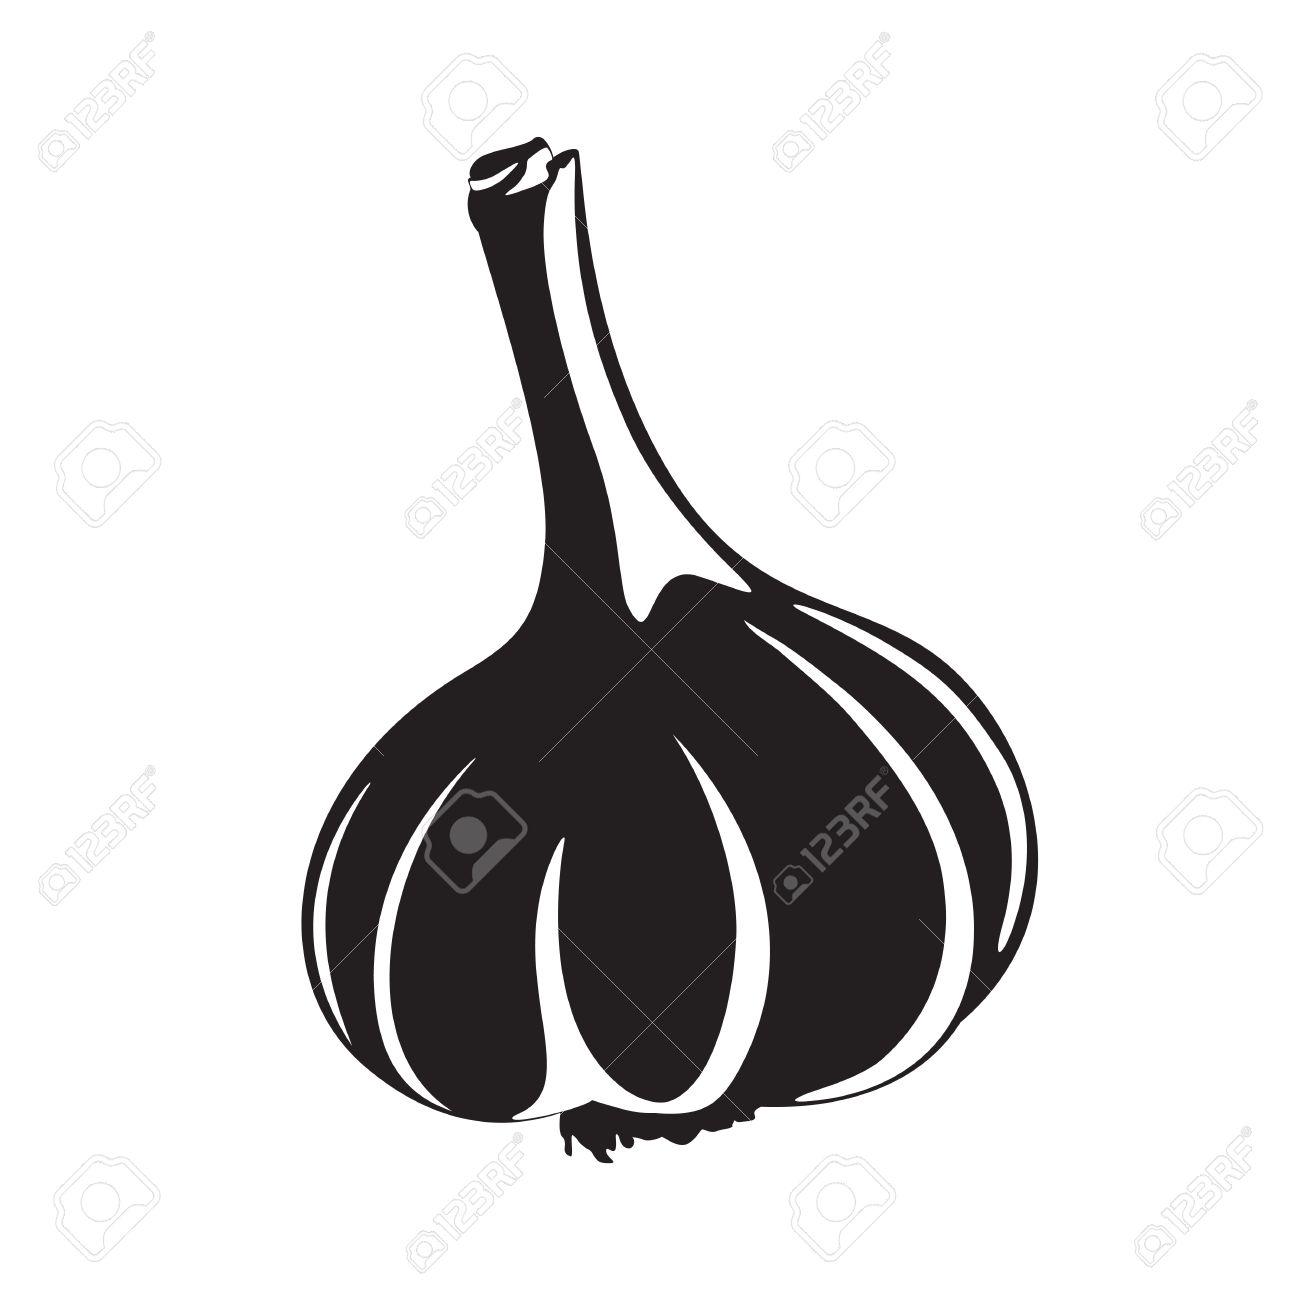 Graphic garlic silhouette, black and white - 25468444